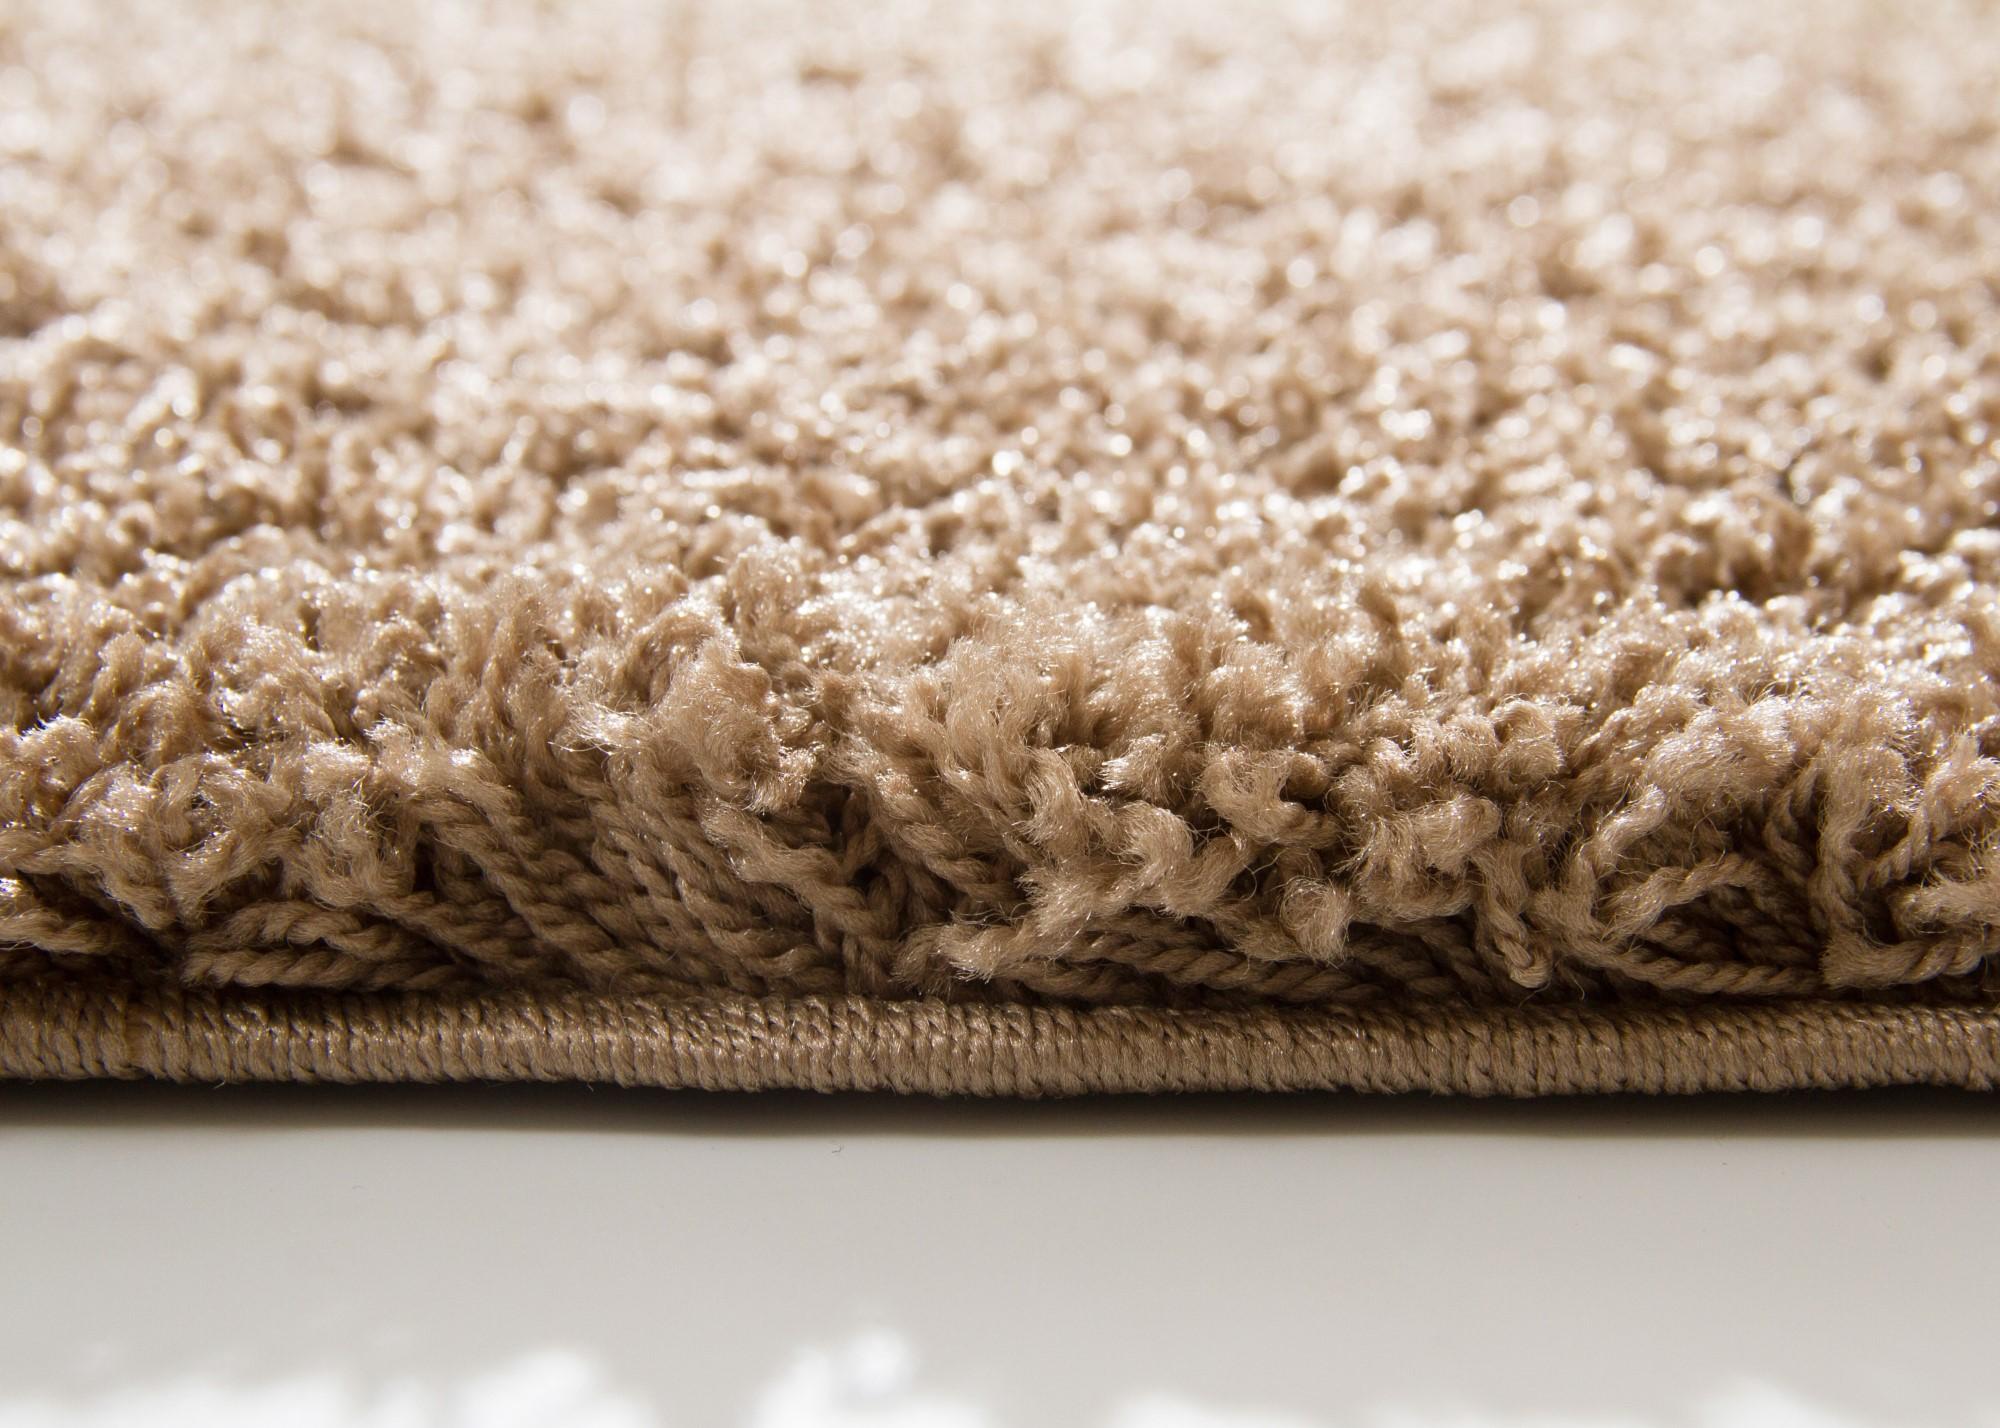 Fußboden Teppich Xl ~ Langflor hochflor teppich happy xl top qualität g qm